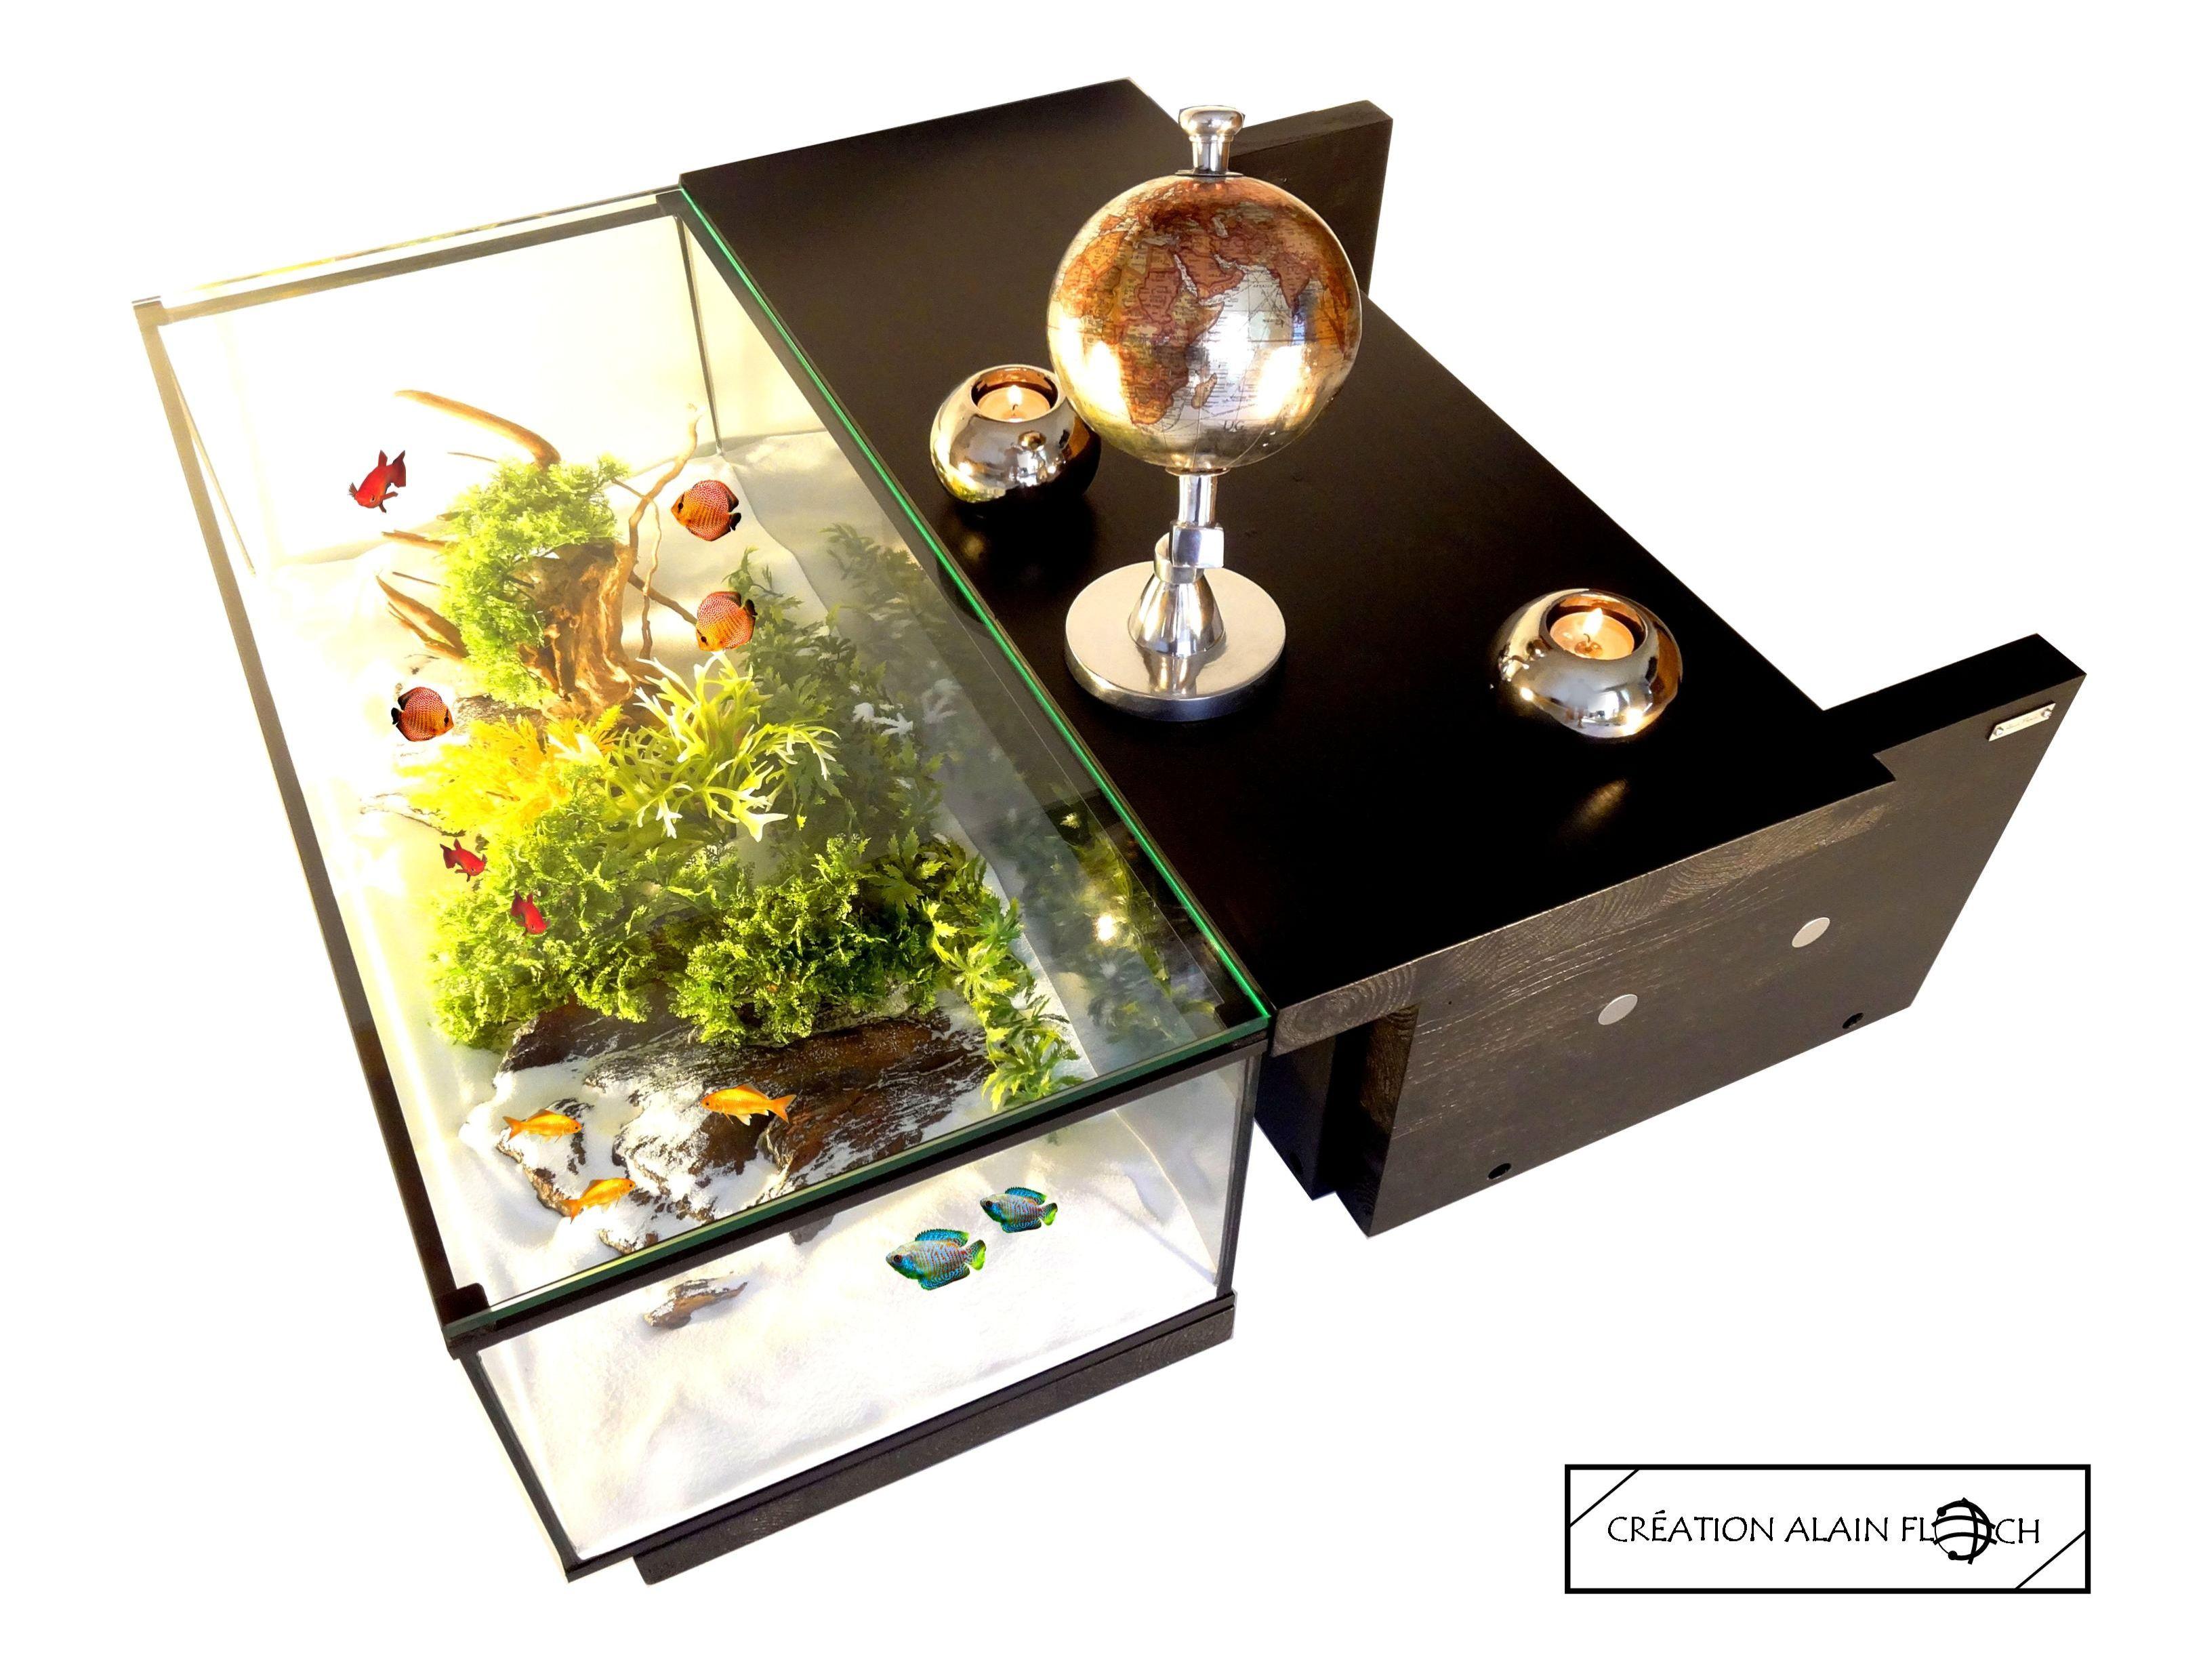 Table Basse Design VOYAGE Avec Grand Aquarium 80 Cm   40 LED Sans Fil | Table  Basse Aquarium Terrarium Vivarium Design | Pinterest | Tv Tables, ...